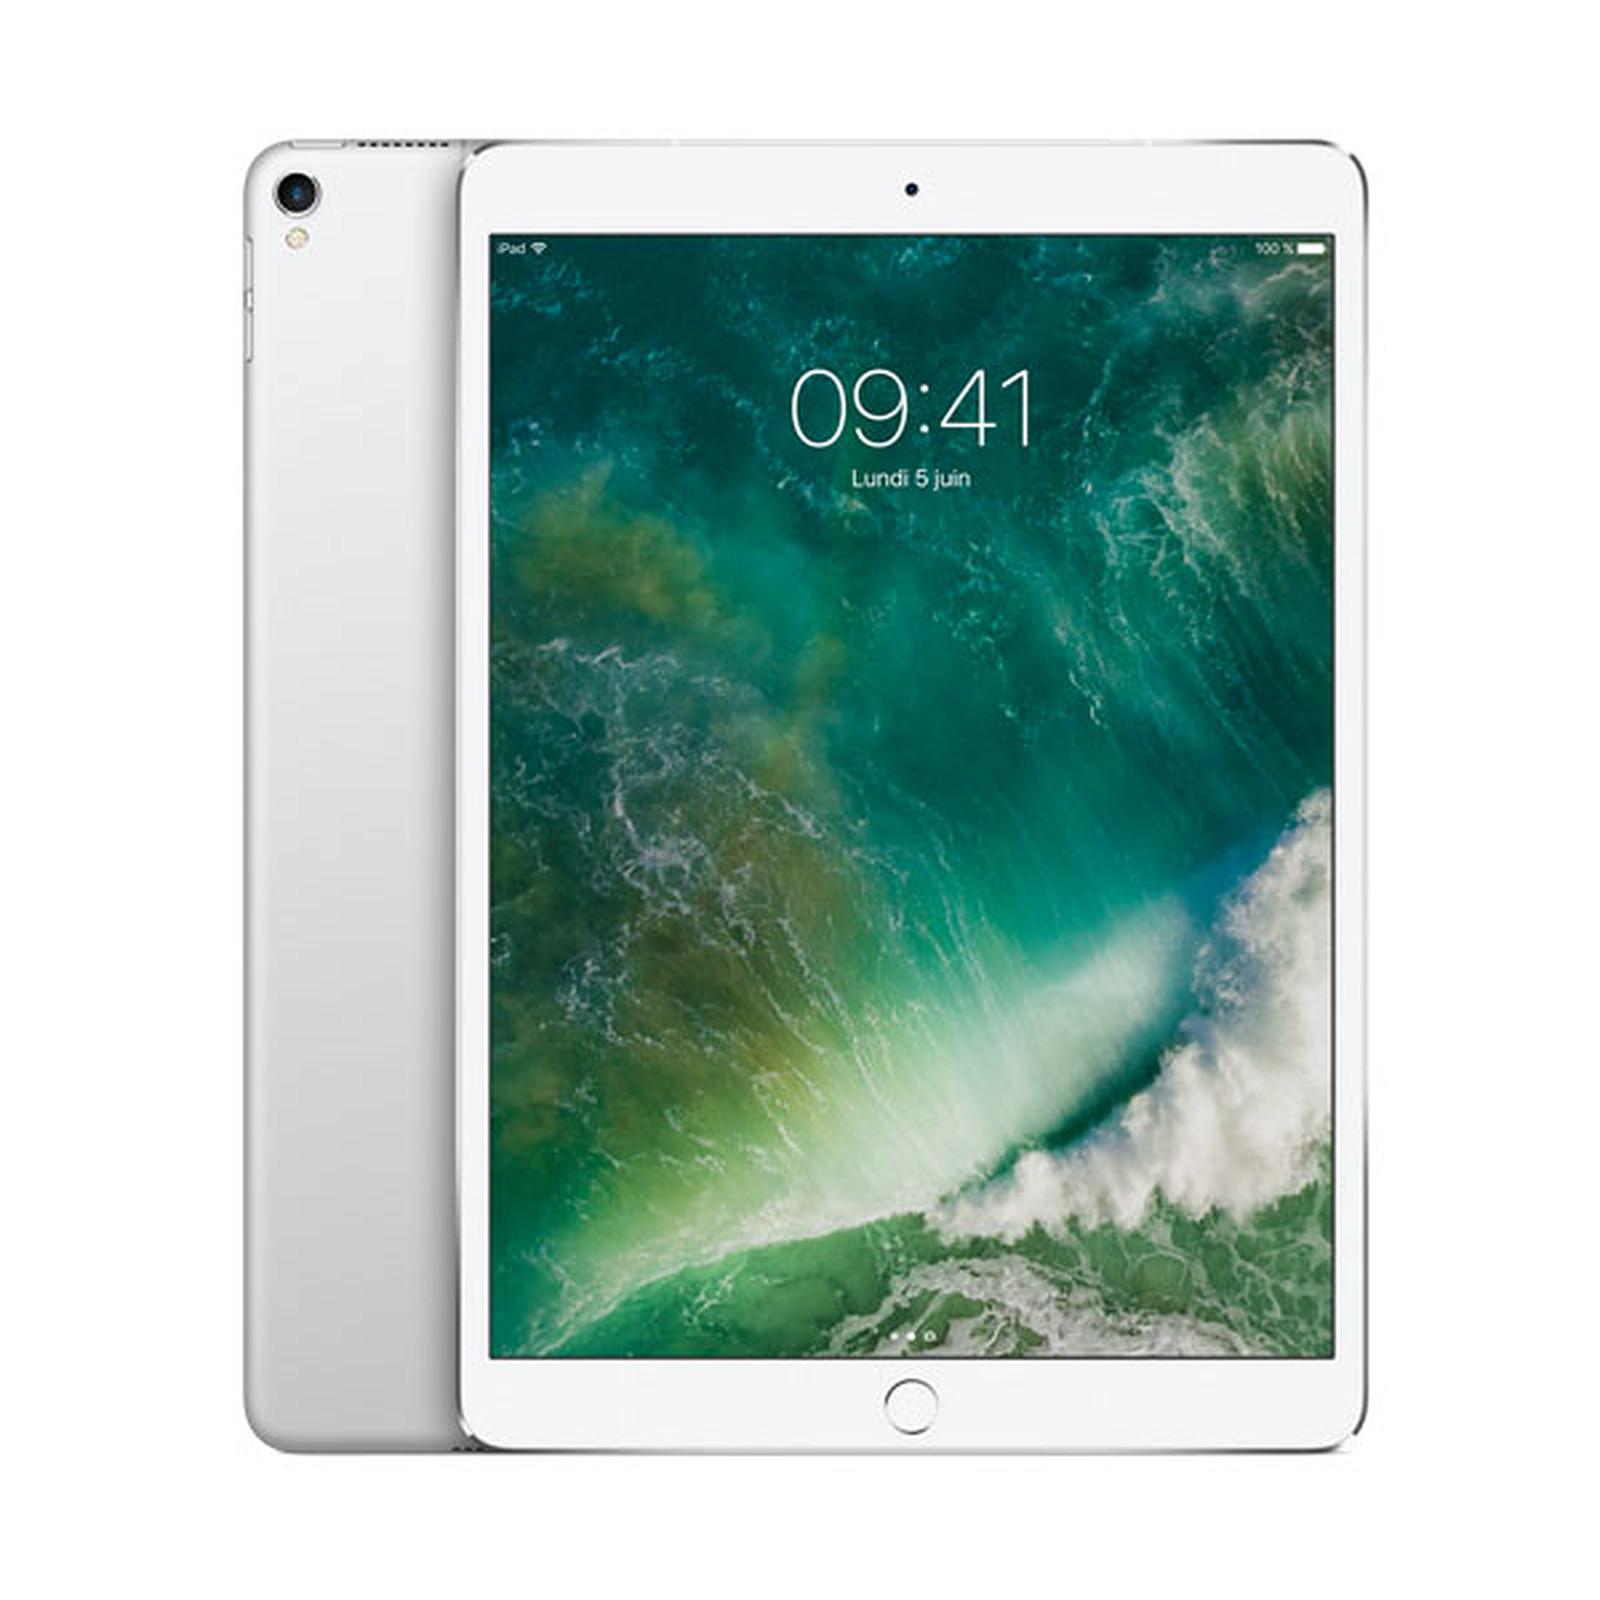 Apple iPad Pro 10.5 pulgadas 64GB Wi-Fi Wi-Fi + Cellular Silver